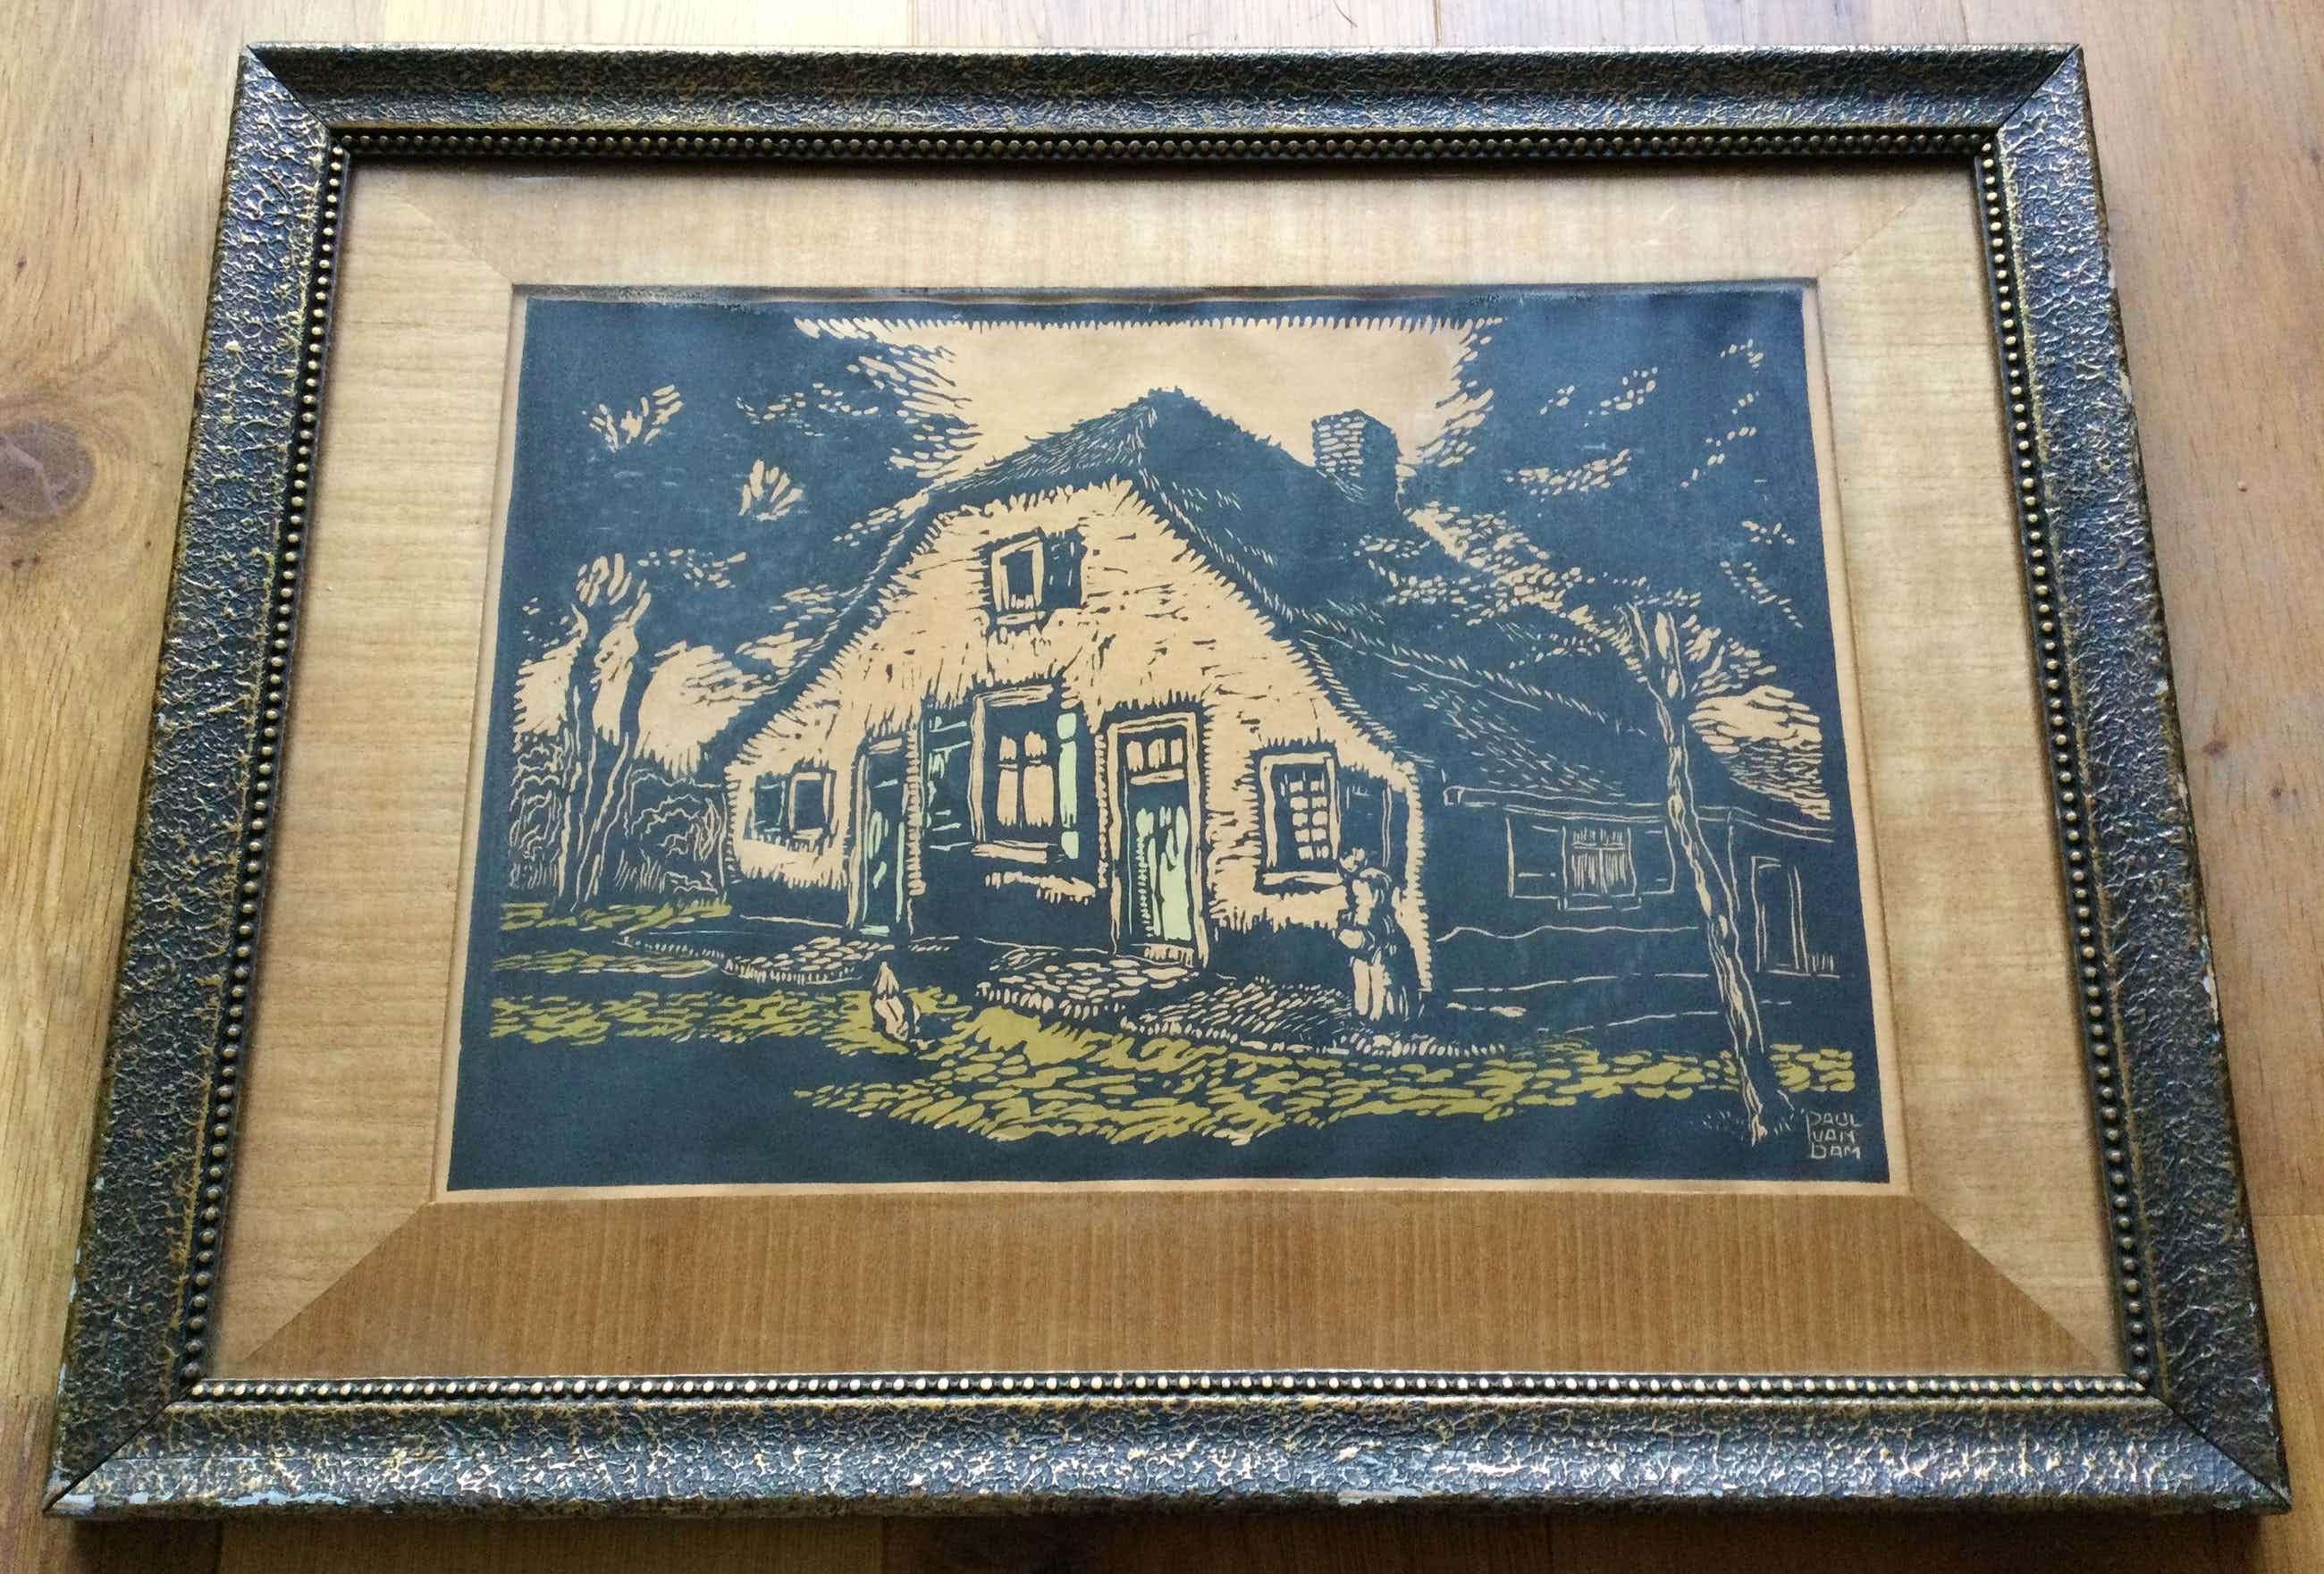 Paul van Dam - Veluwse boerderij | houtsnede - gekleurd in bewerkte houten lijst kopen? Bied vanaf 20!